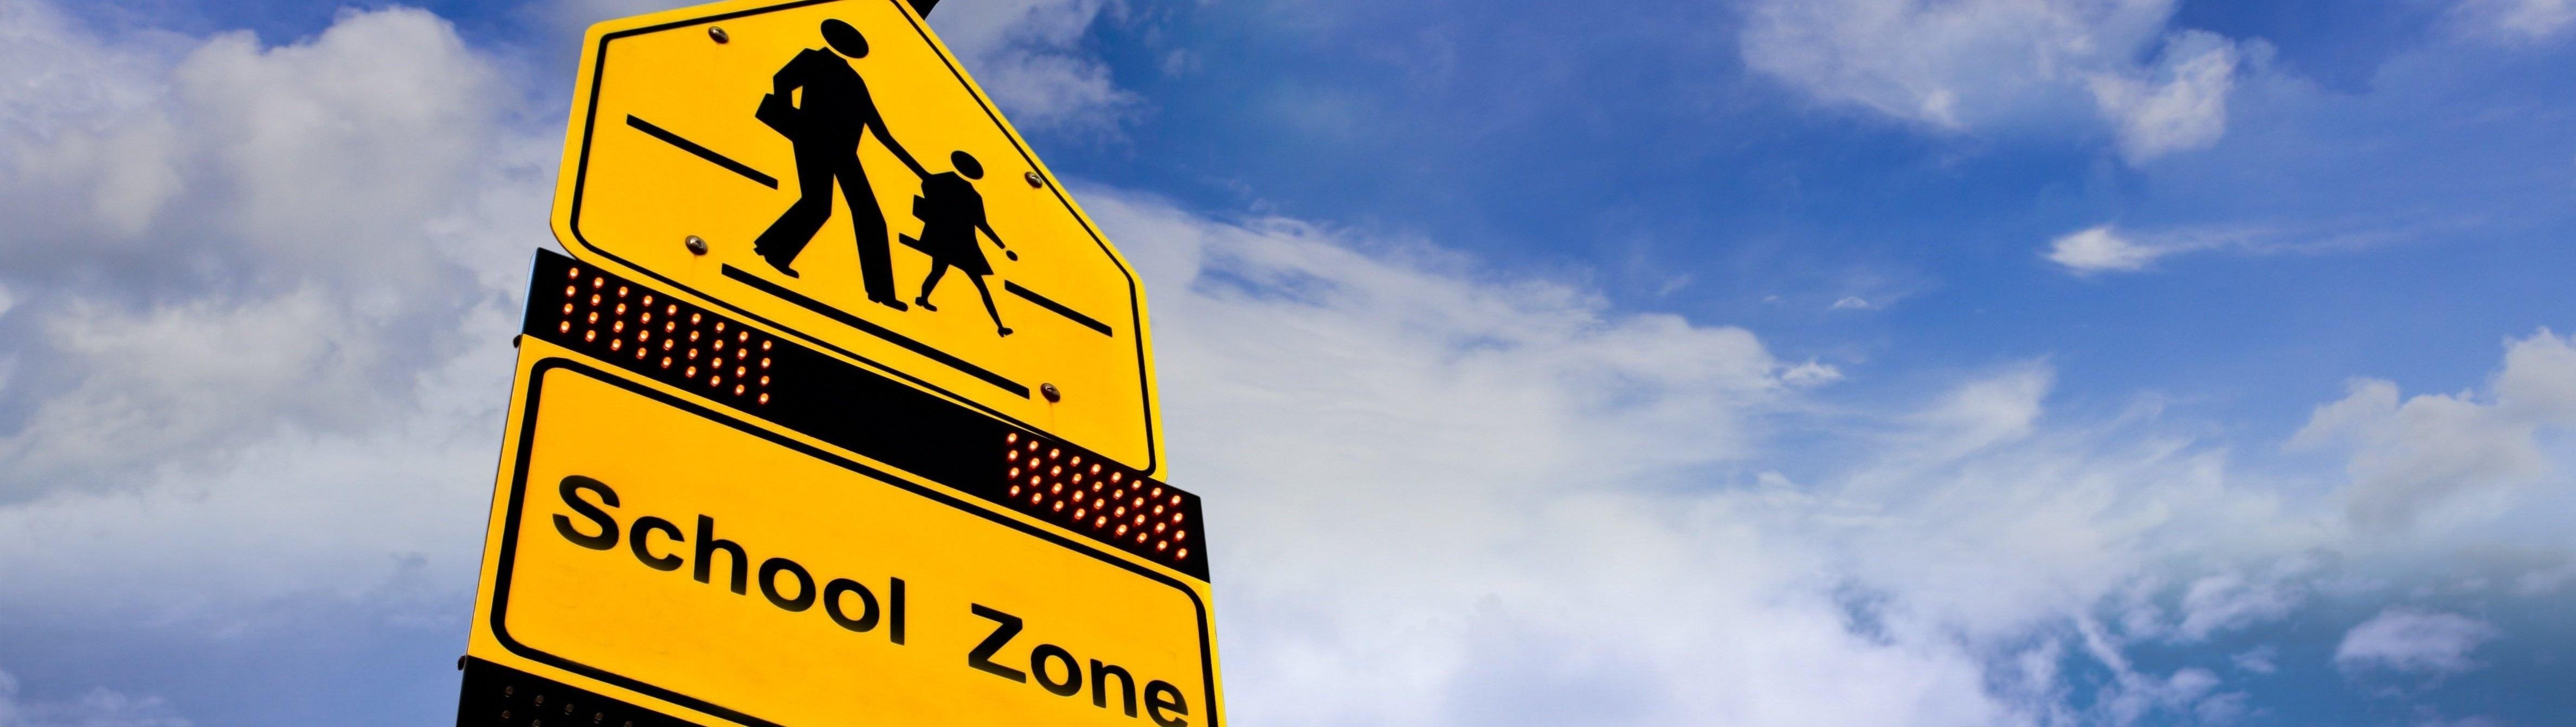 School Zone Safety Sign